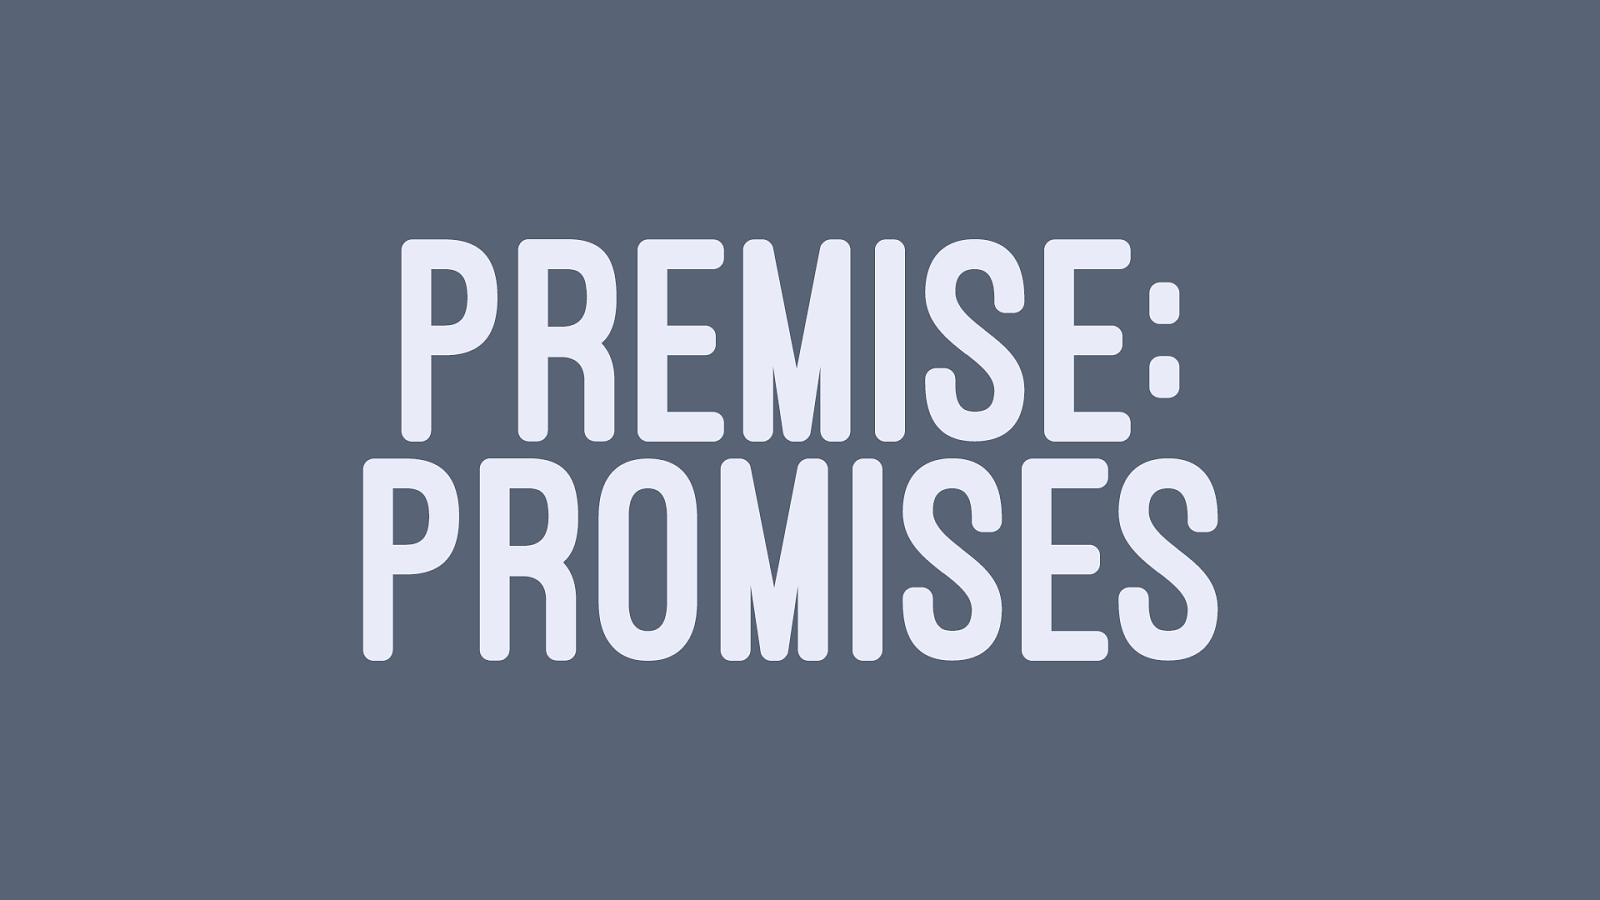 Premise: Promises